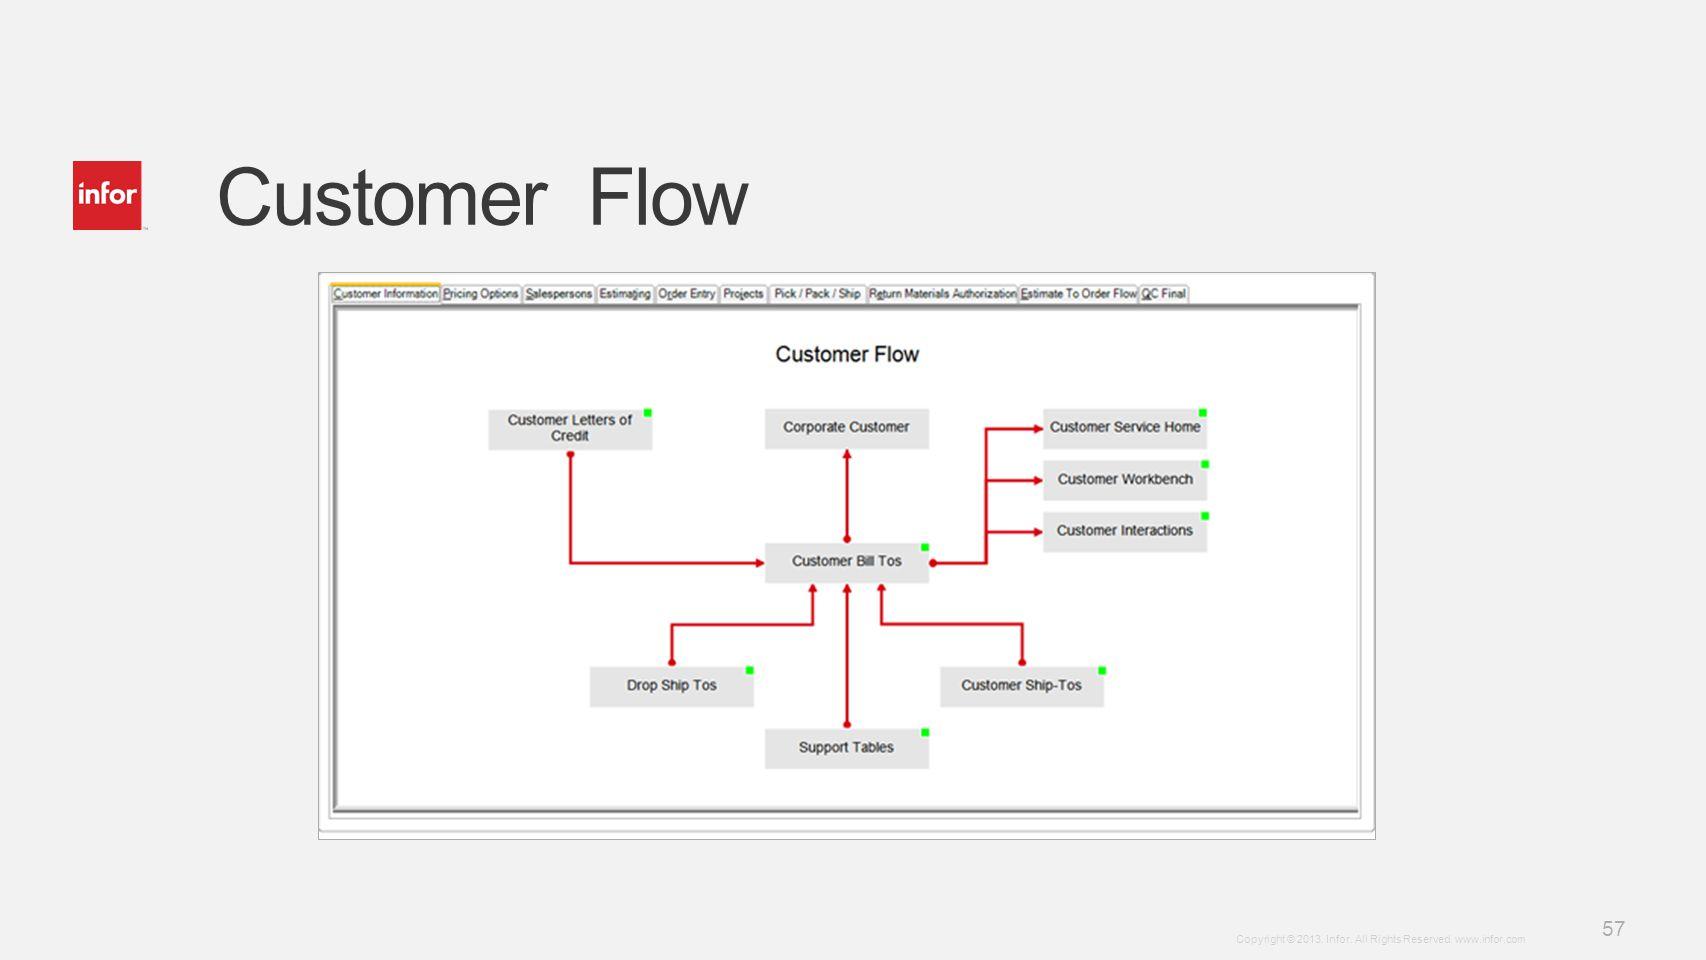 Customer Flow